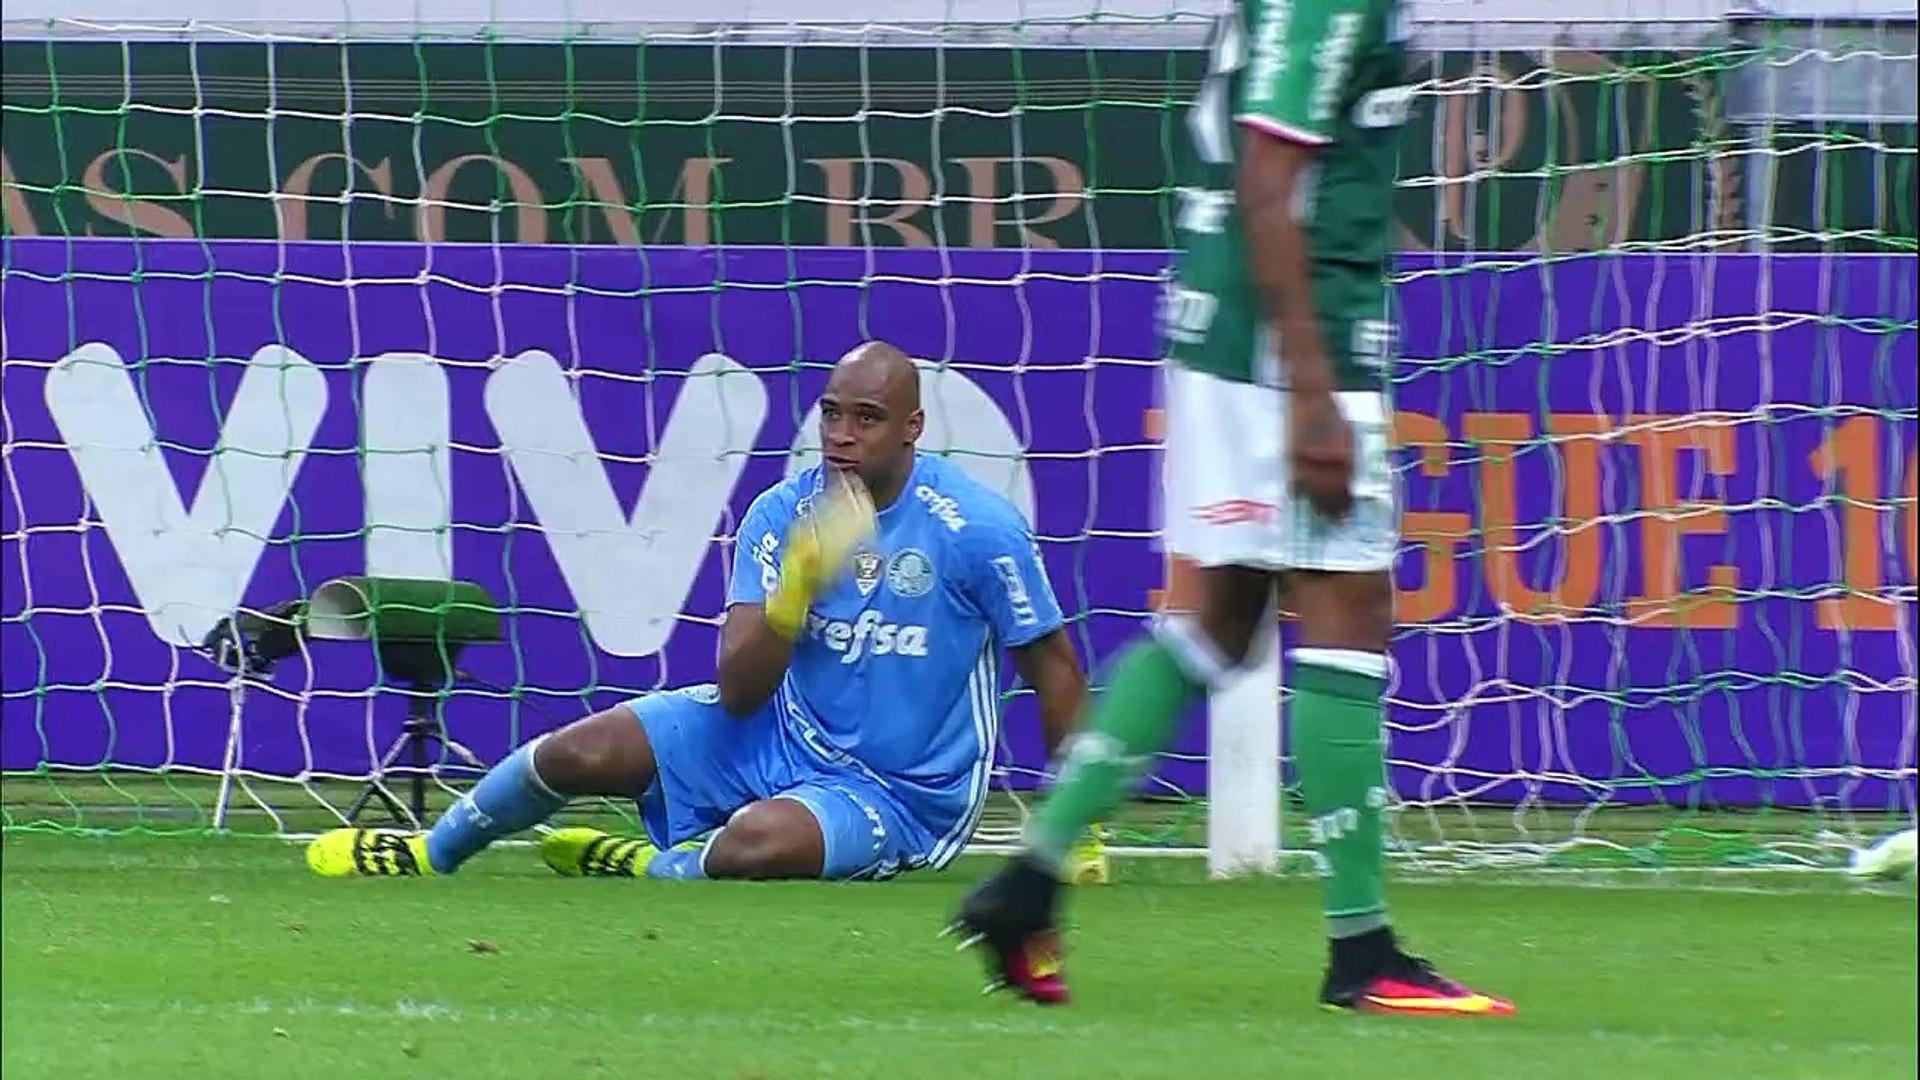 21 Rodada - Palmeiras 2x2 Ponte Preta (Campeonato Brasileiro 2016)